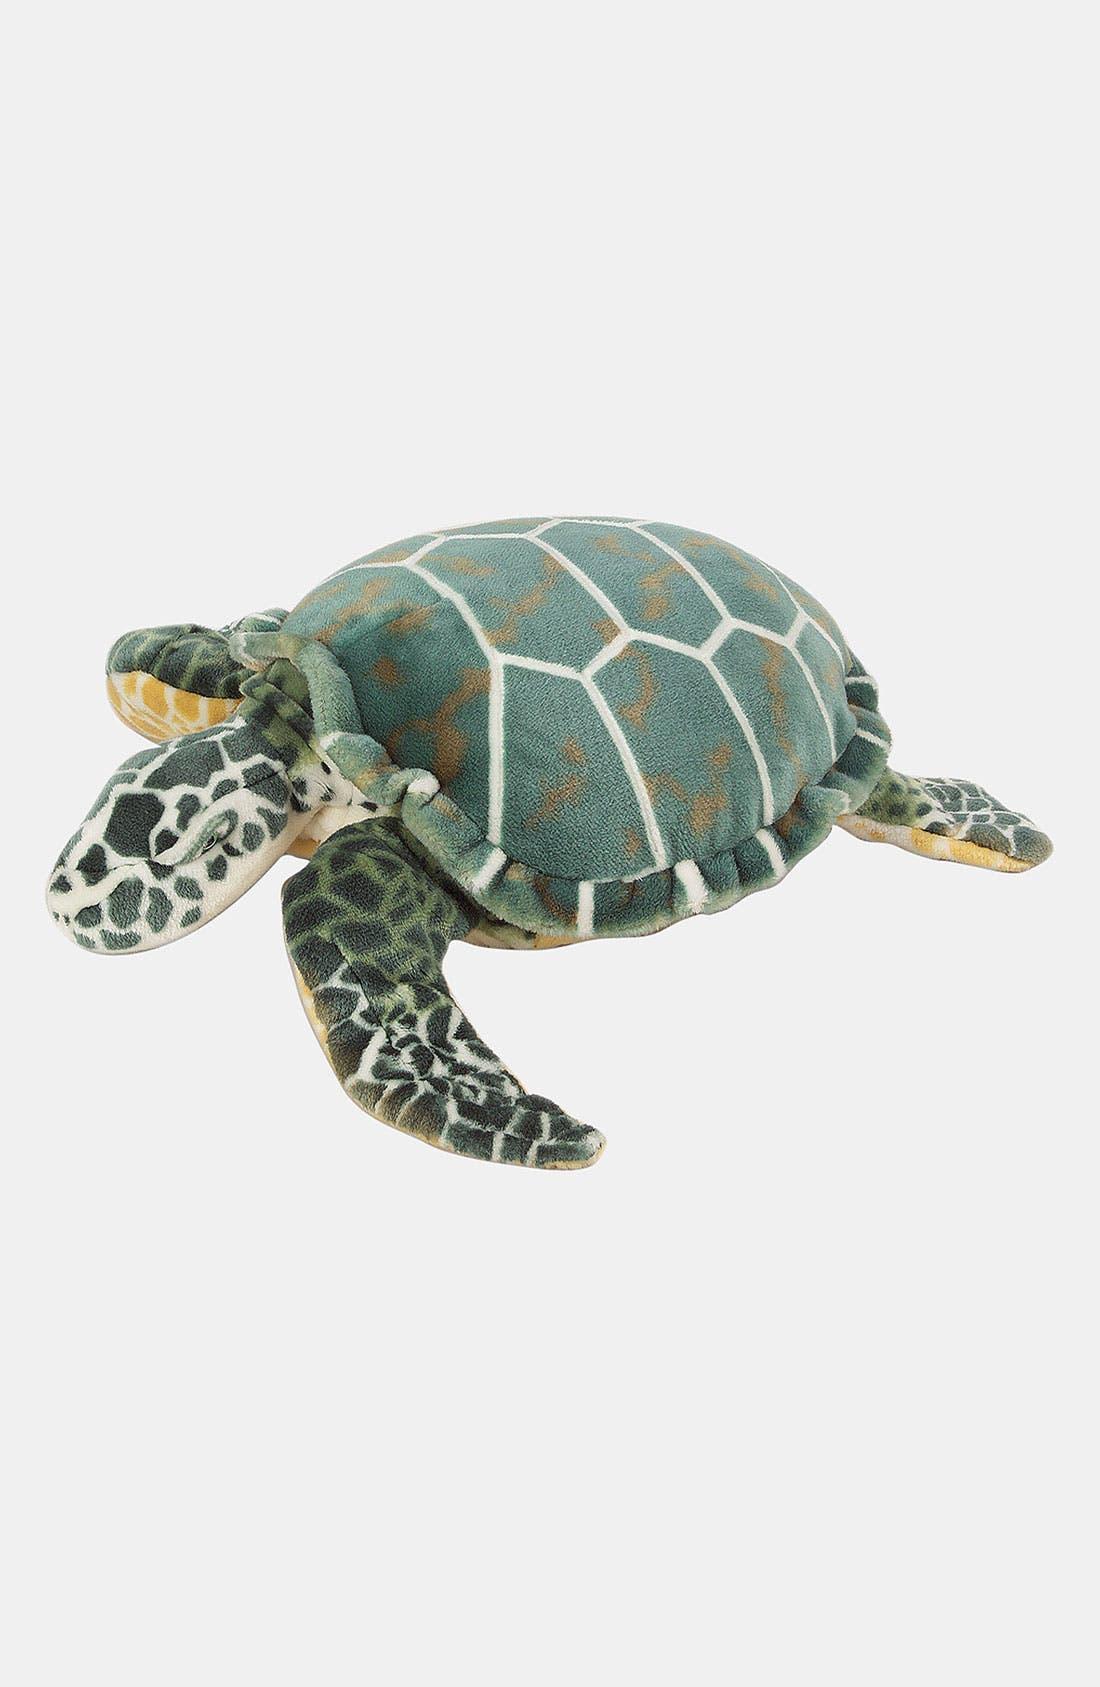 Main Image - Melissa & Doug Oversized Plush Stuffed Sea Turtle